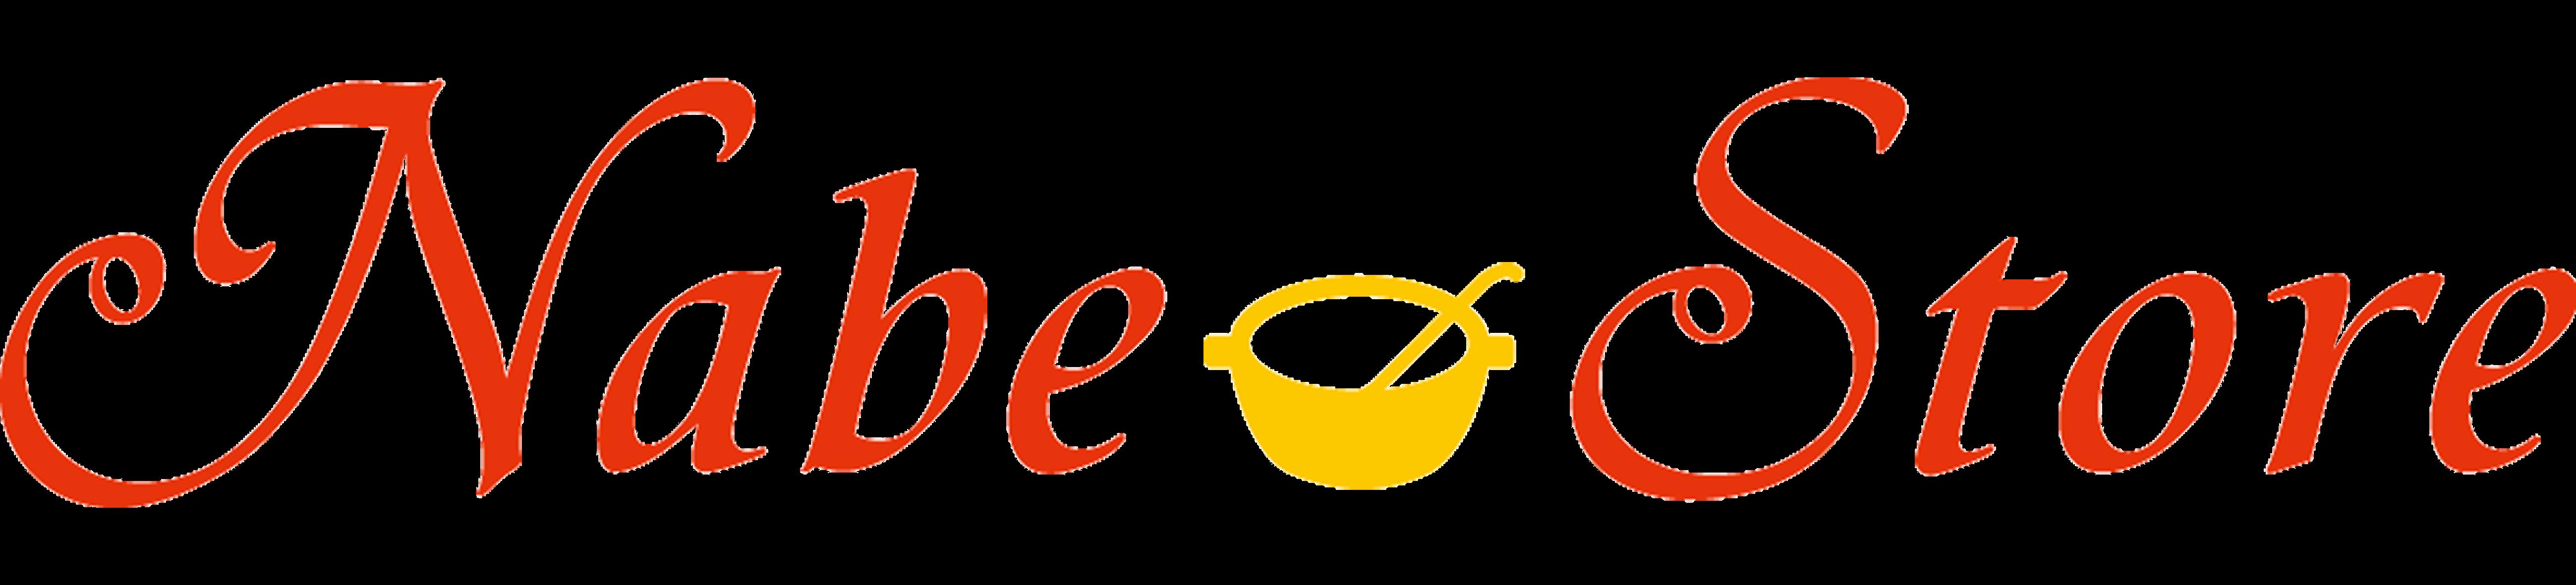 NABESTORE オフィシャルサイト